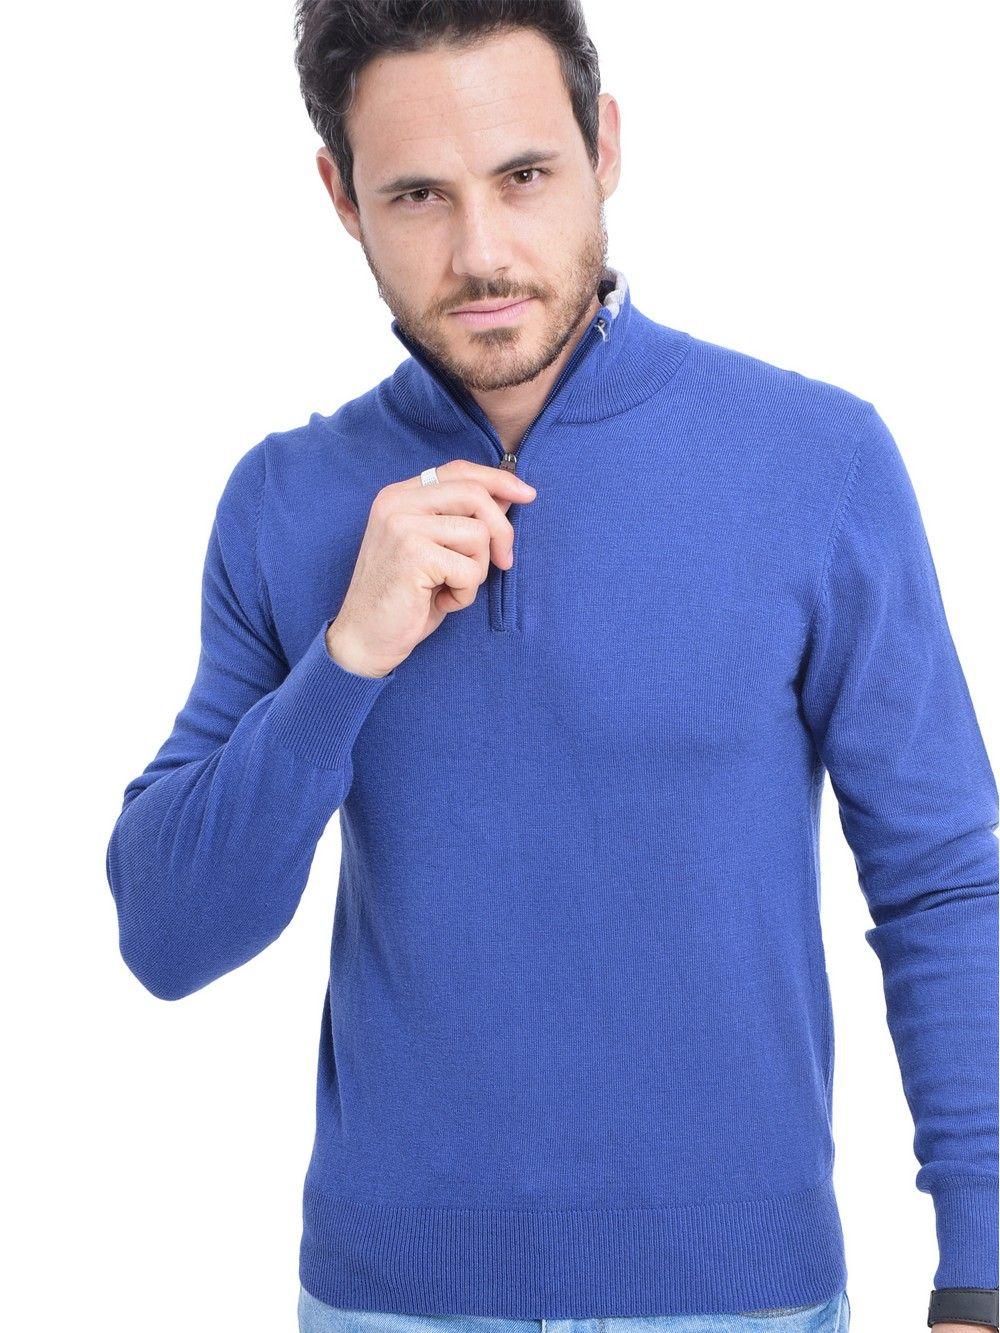 William De Faye Half Zip Sweater with Two-tone Collar in Blue